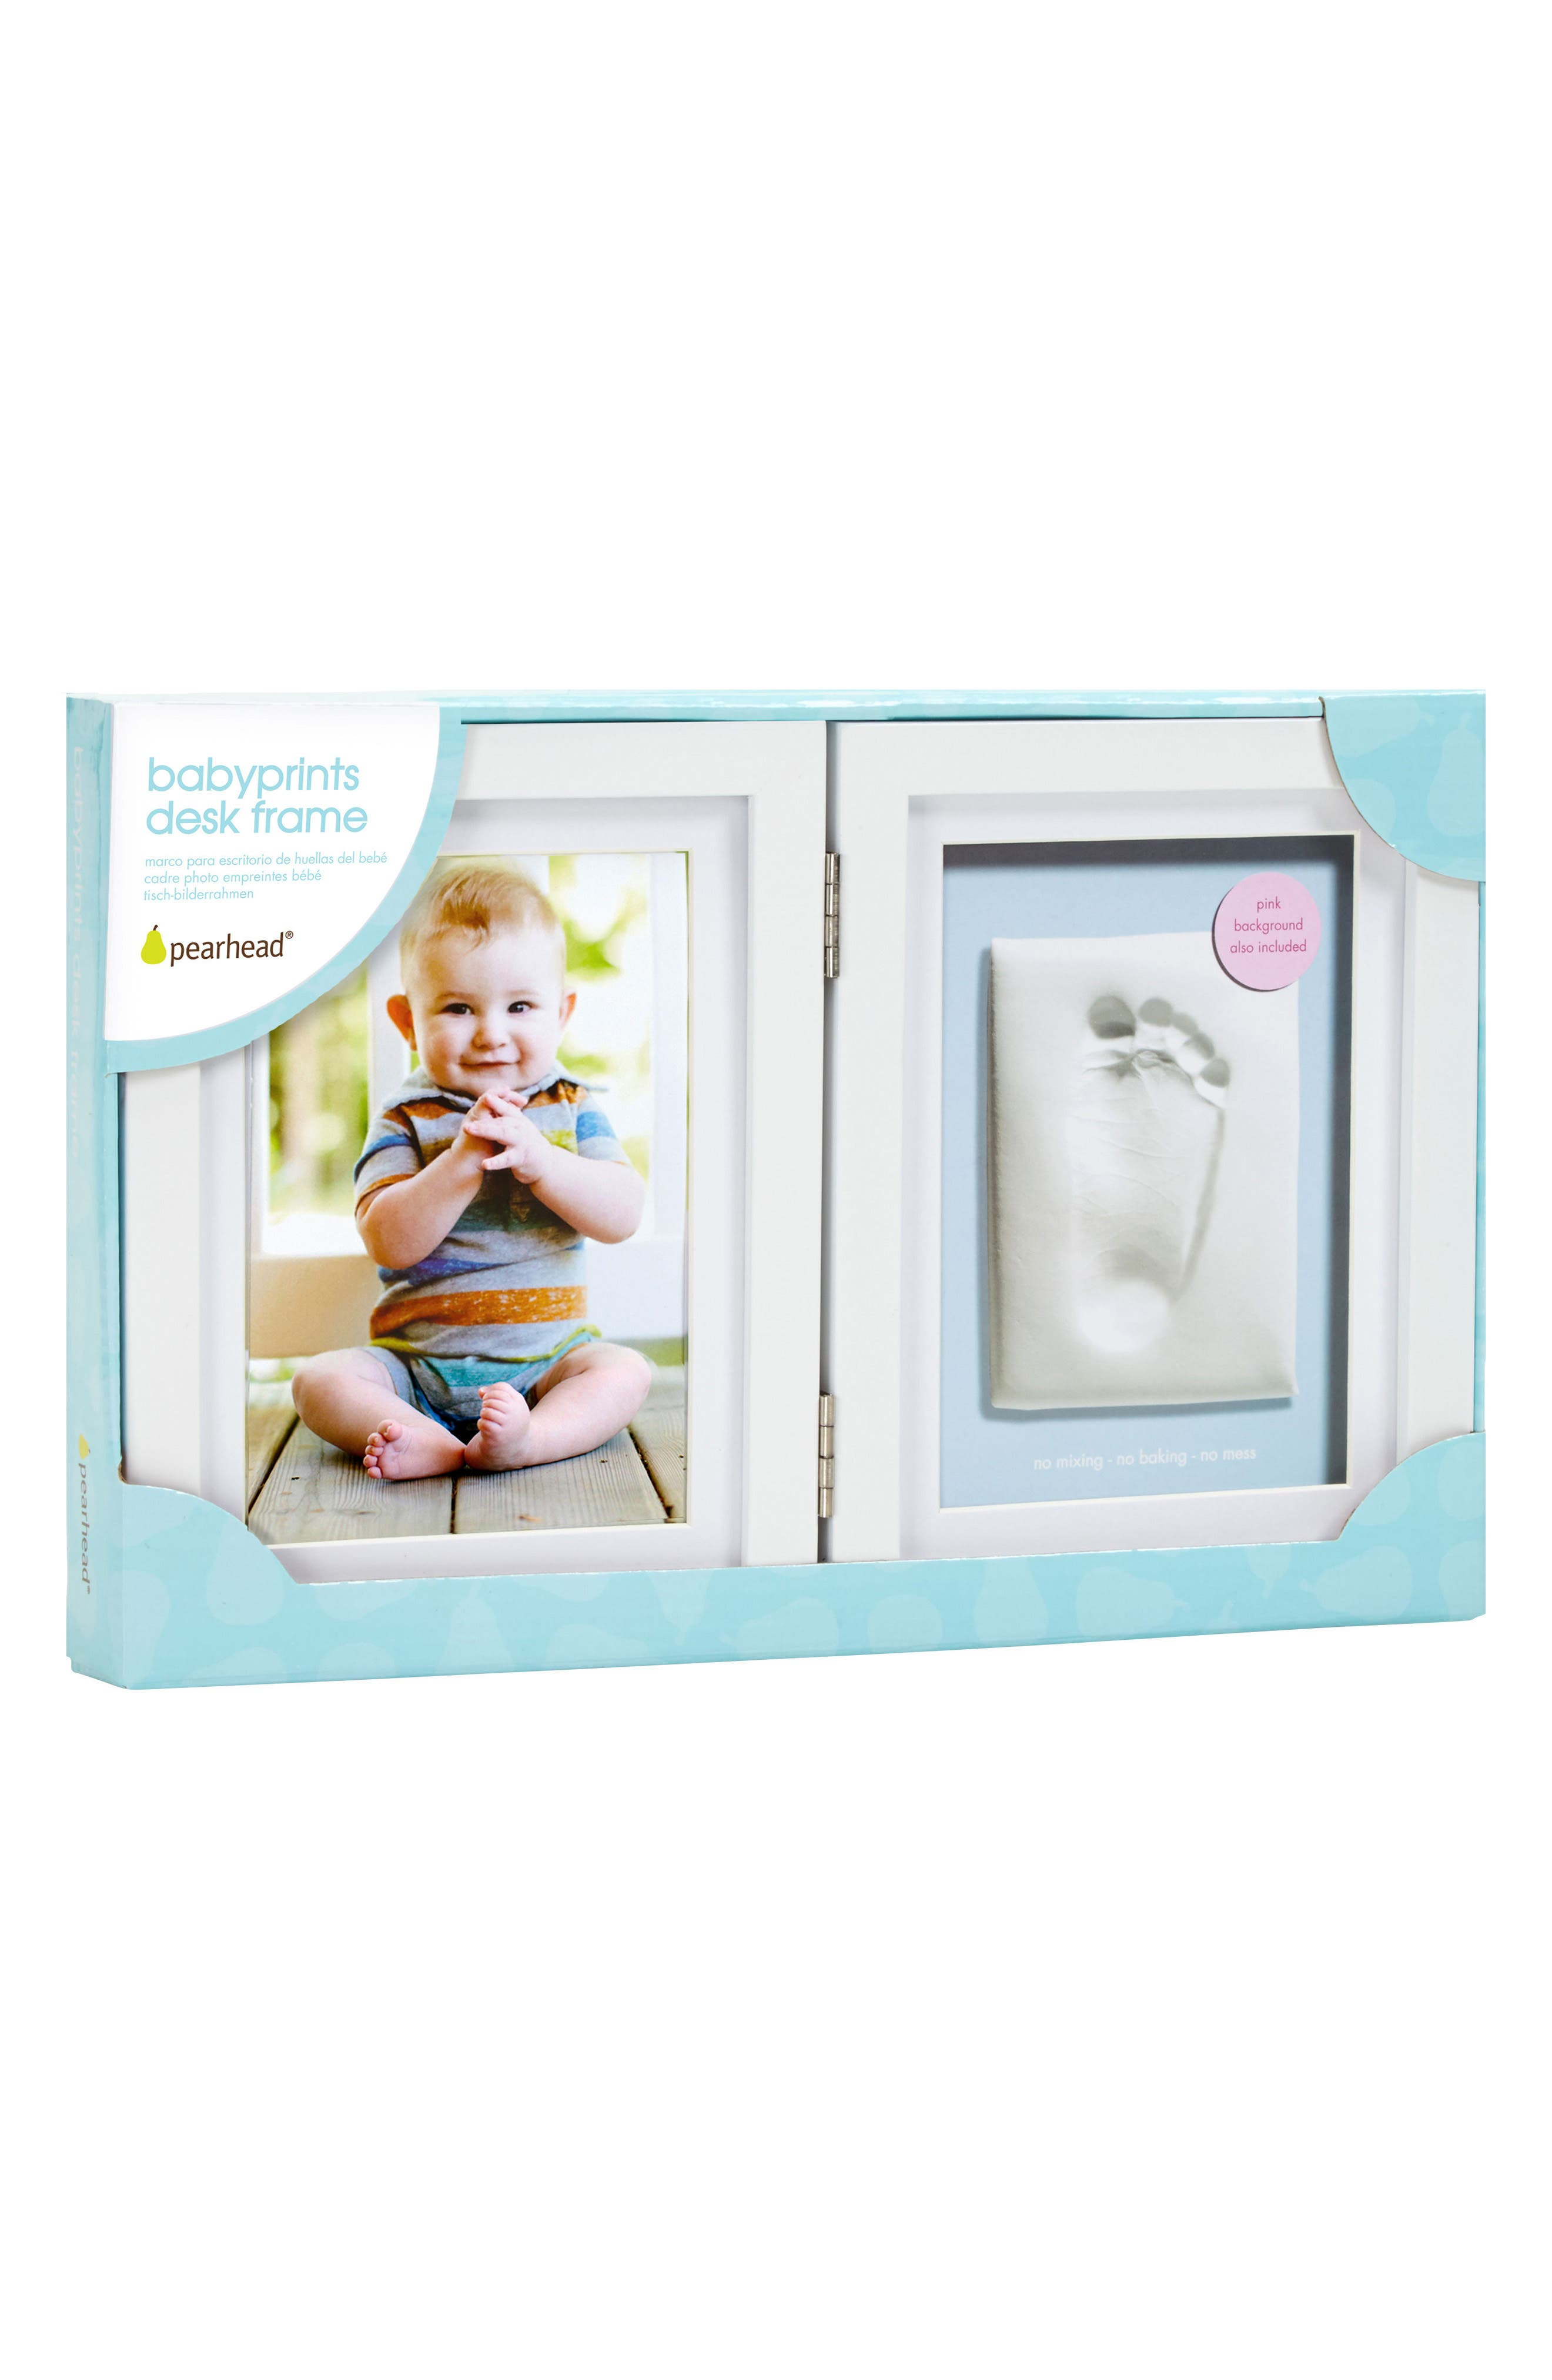 Alternate Image 1 Selected - Pearhead Babyprints Desk Frame